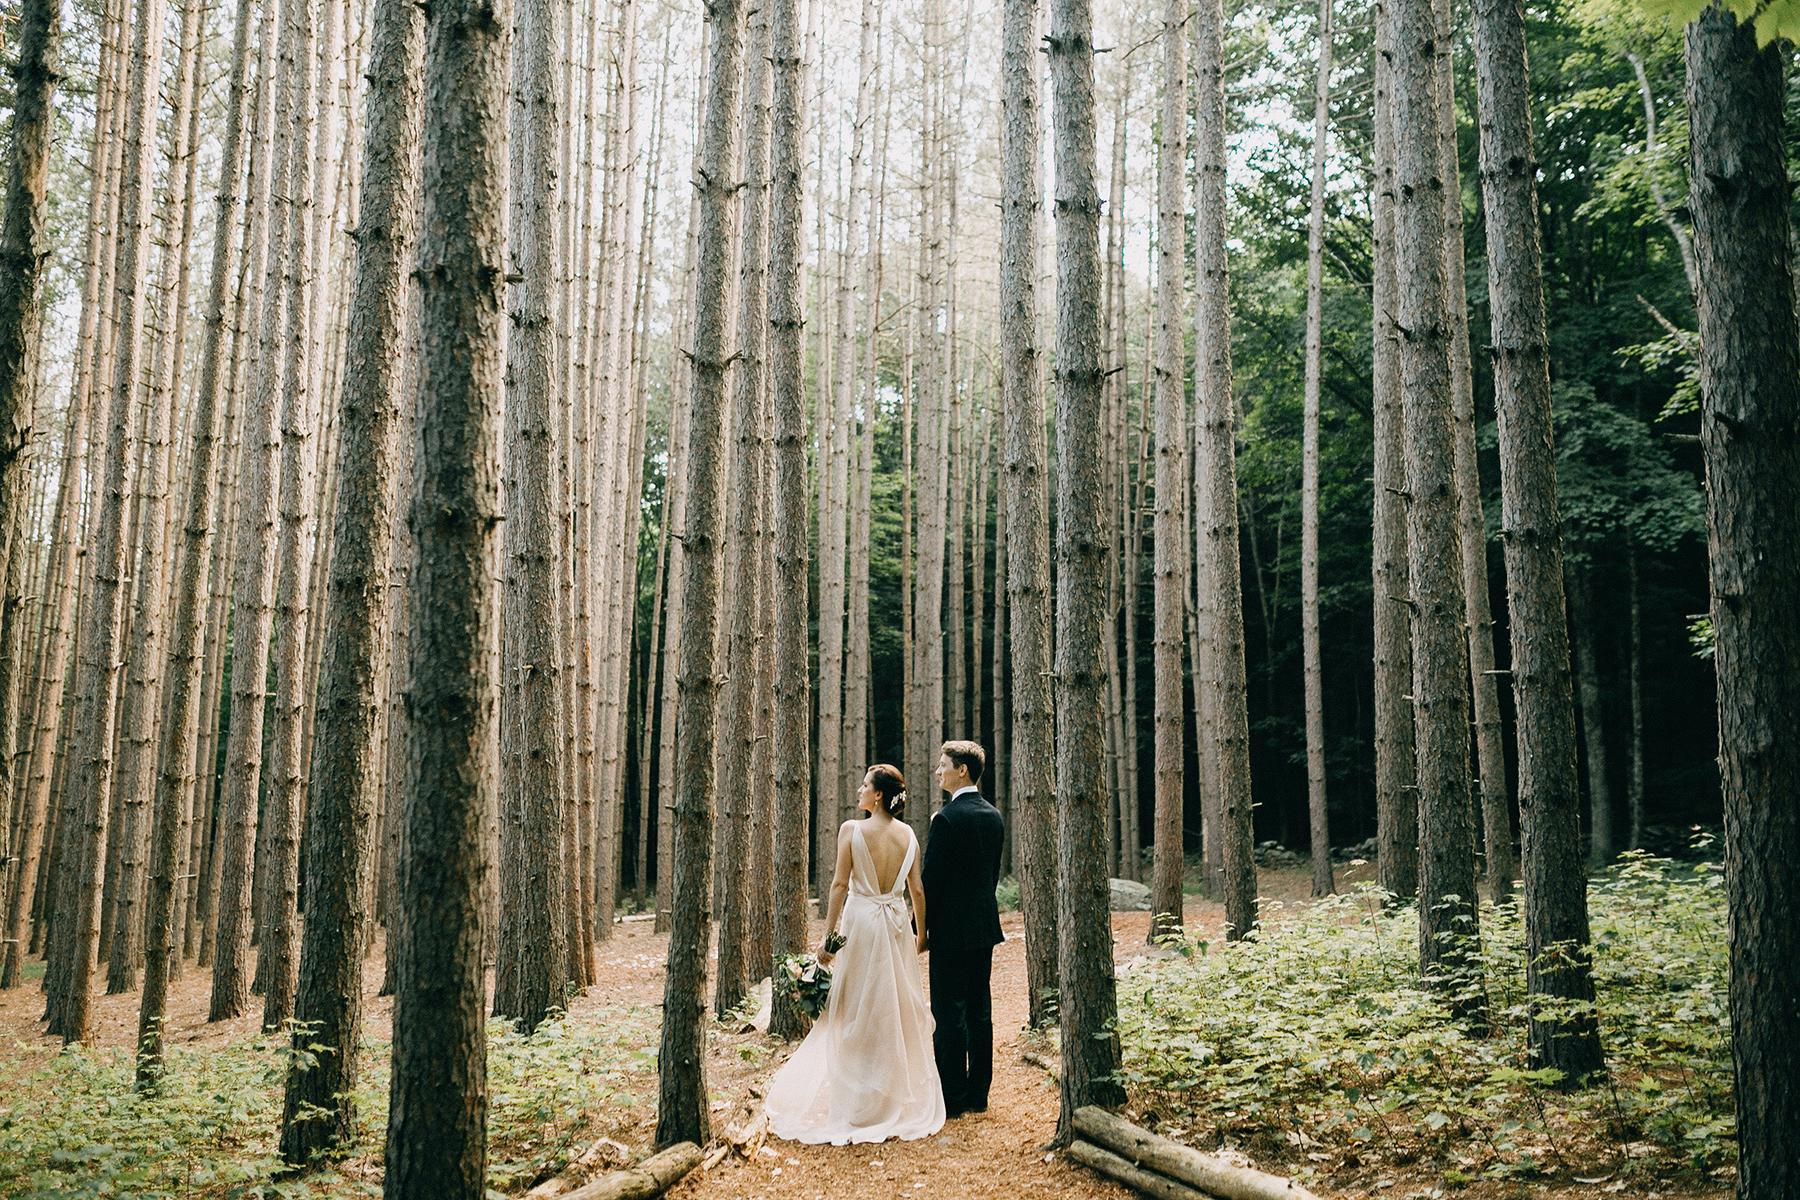 Rustic Destination Wedding Venues in the U S